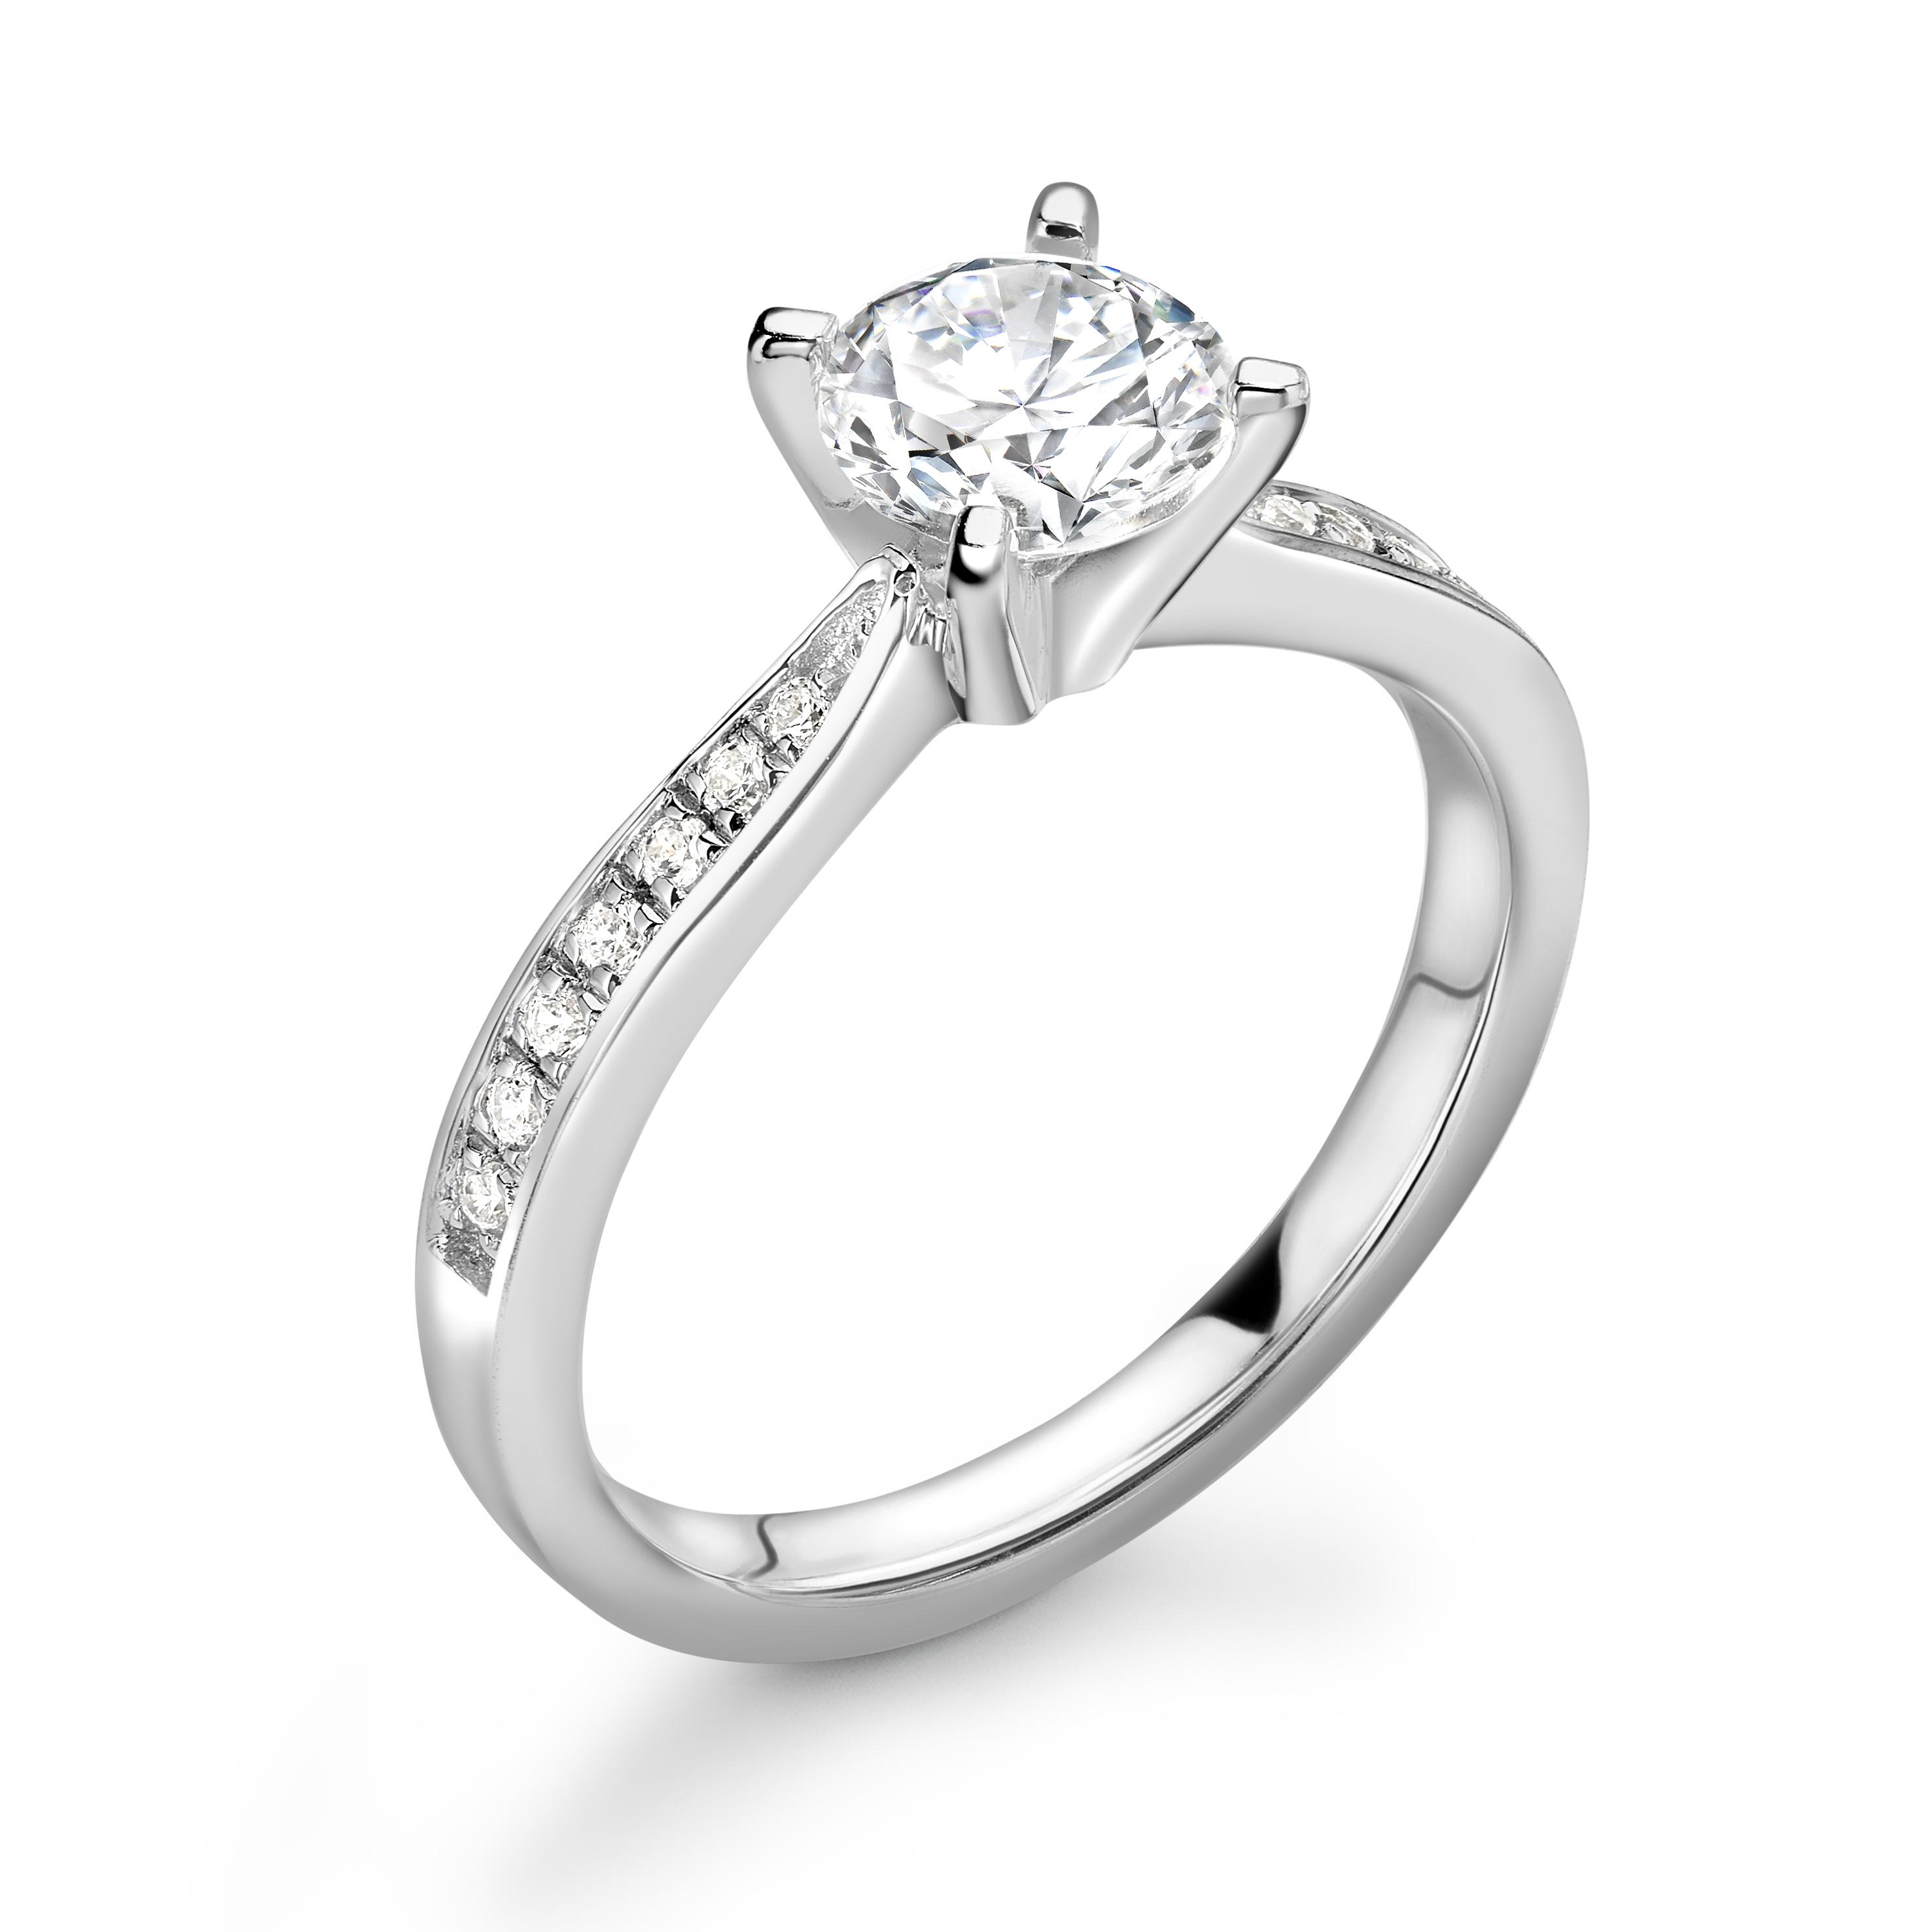 Lot 36 - Platinum Wire Set Diamond Ring 1.19 Carats